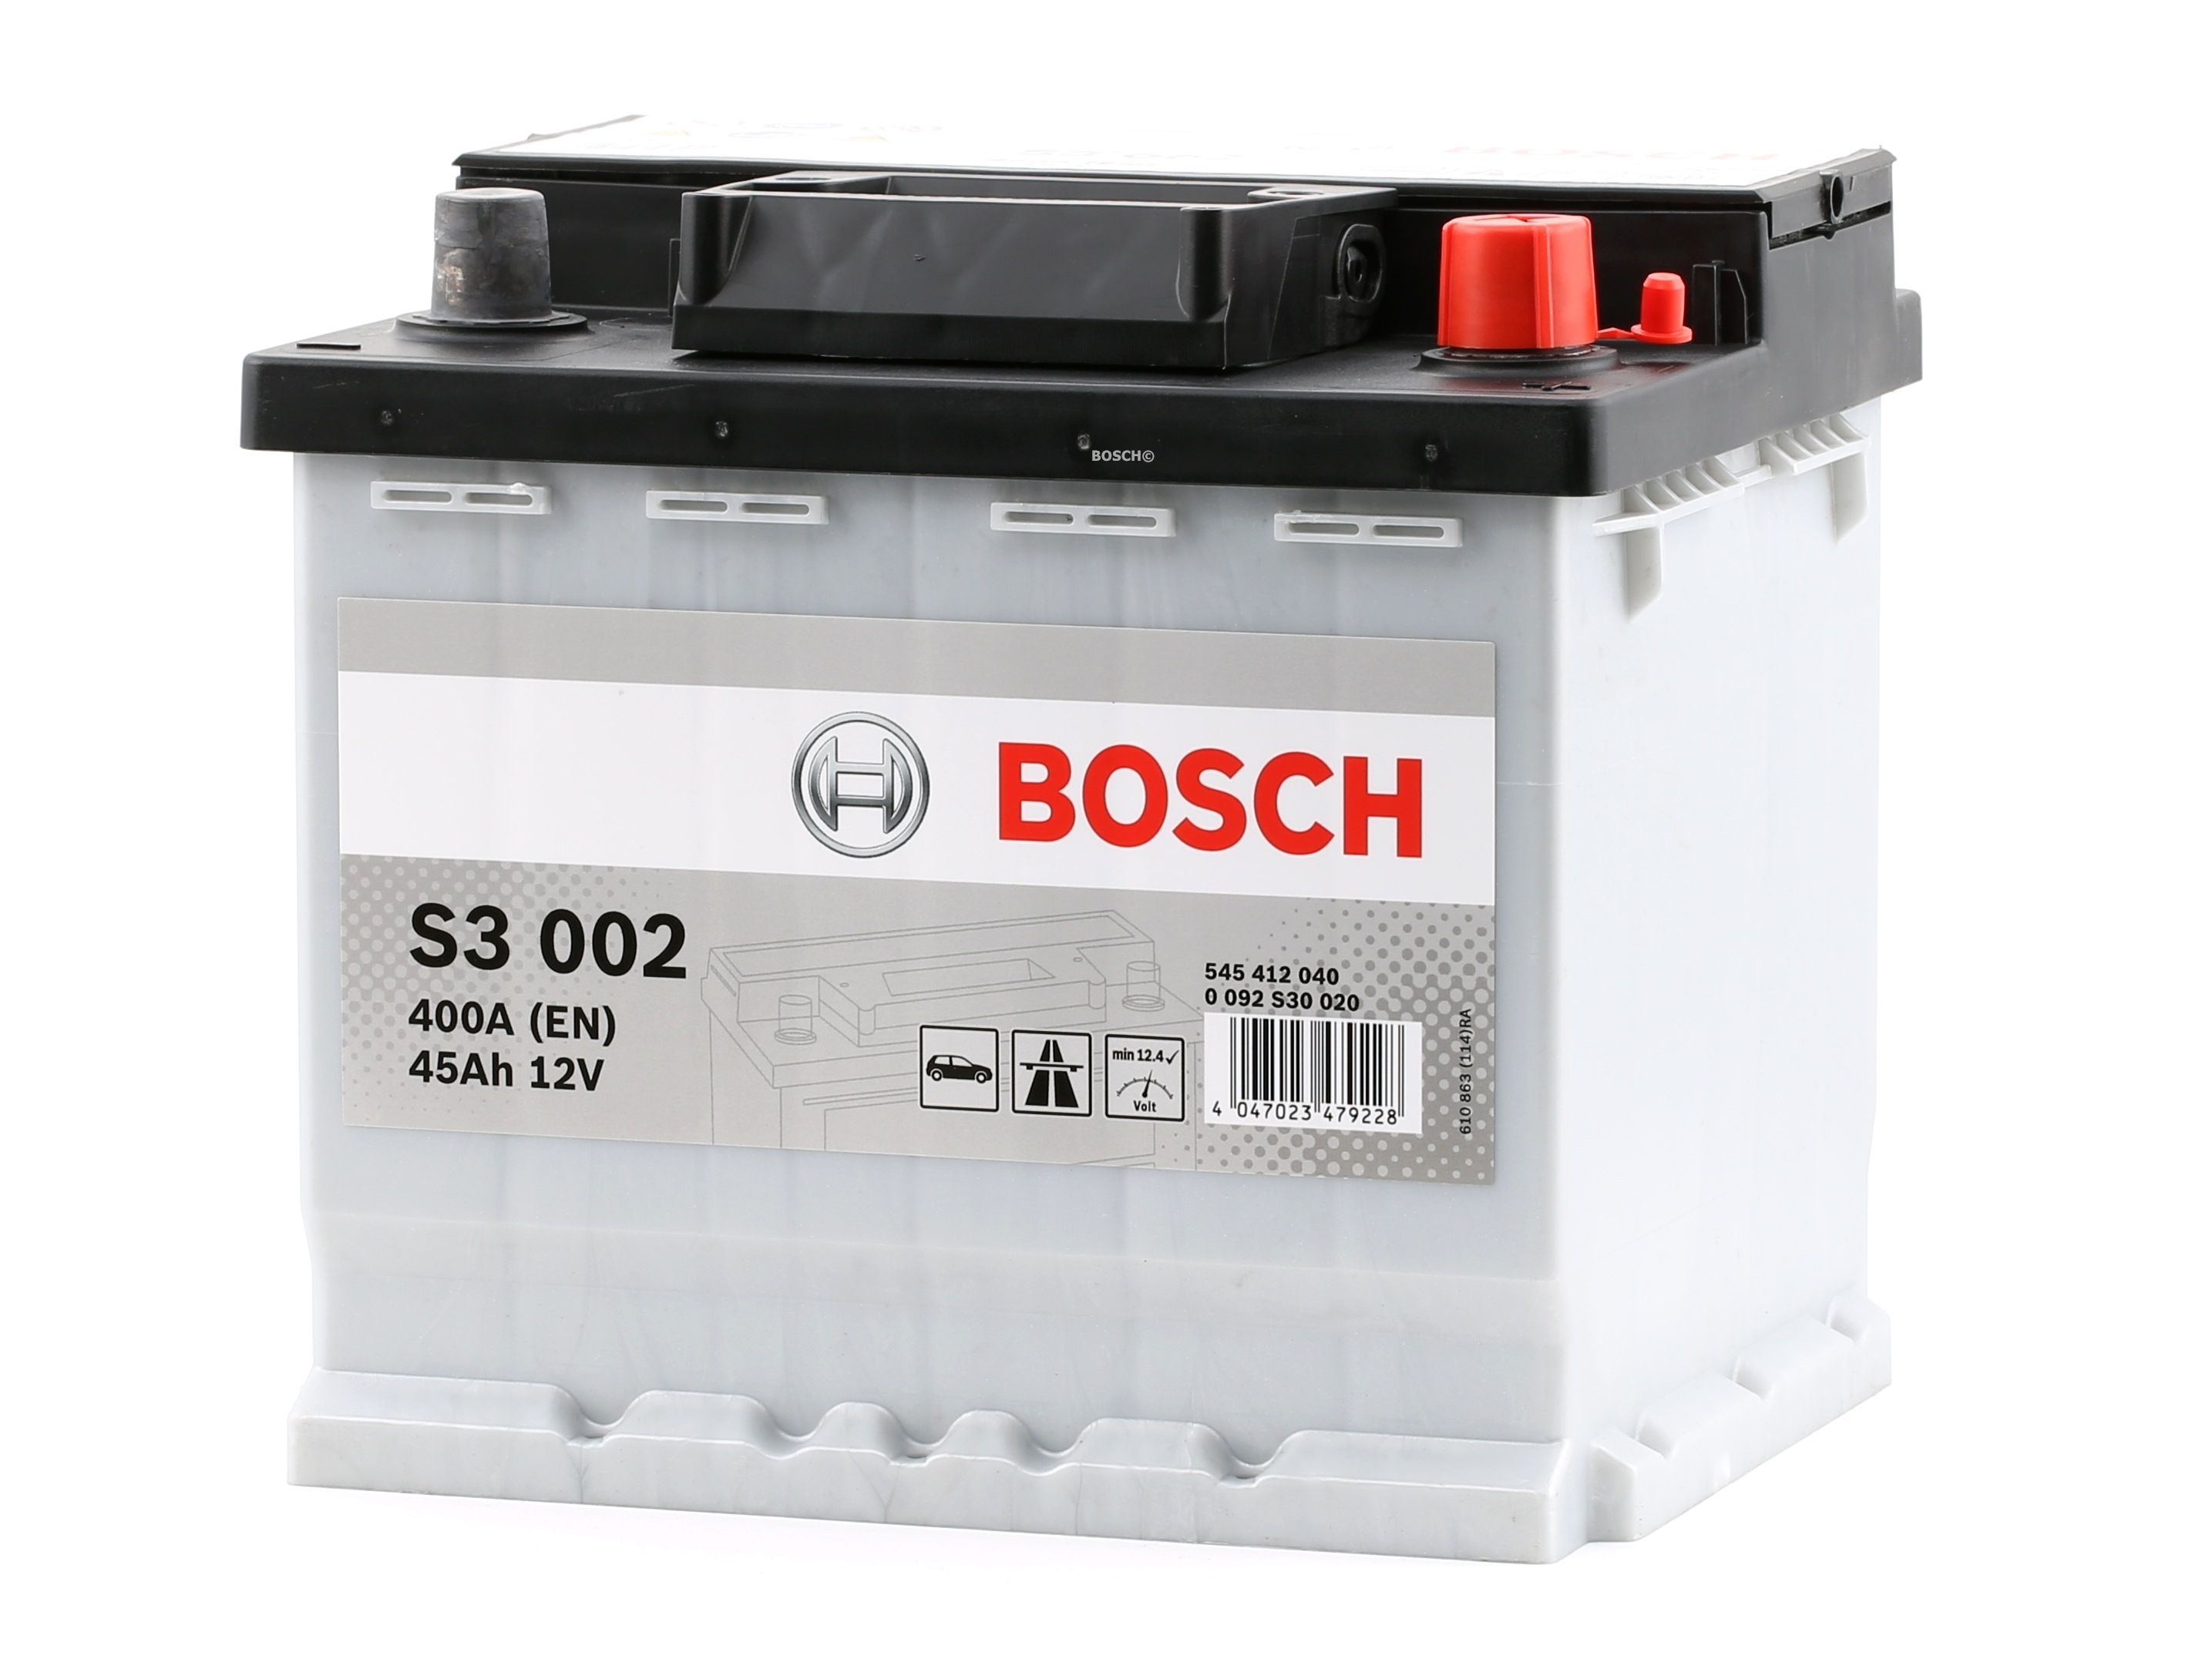 BOSCH: Original Starterbatterie 0 092 S30 020 (Kälteprüfstrom EN: 400A, Spannung: 12V)